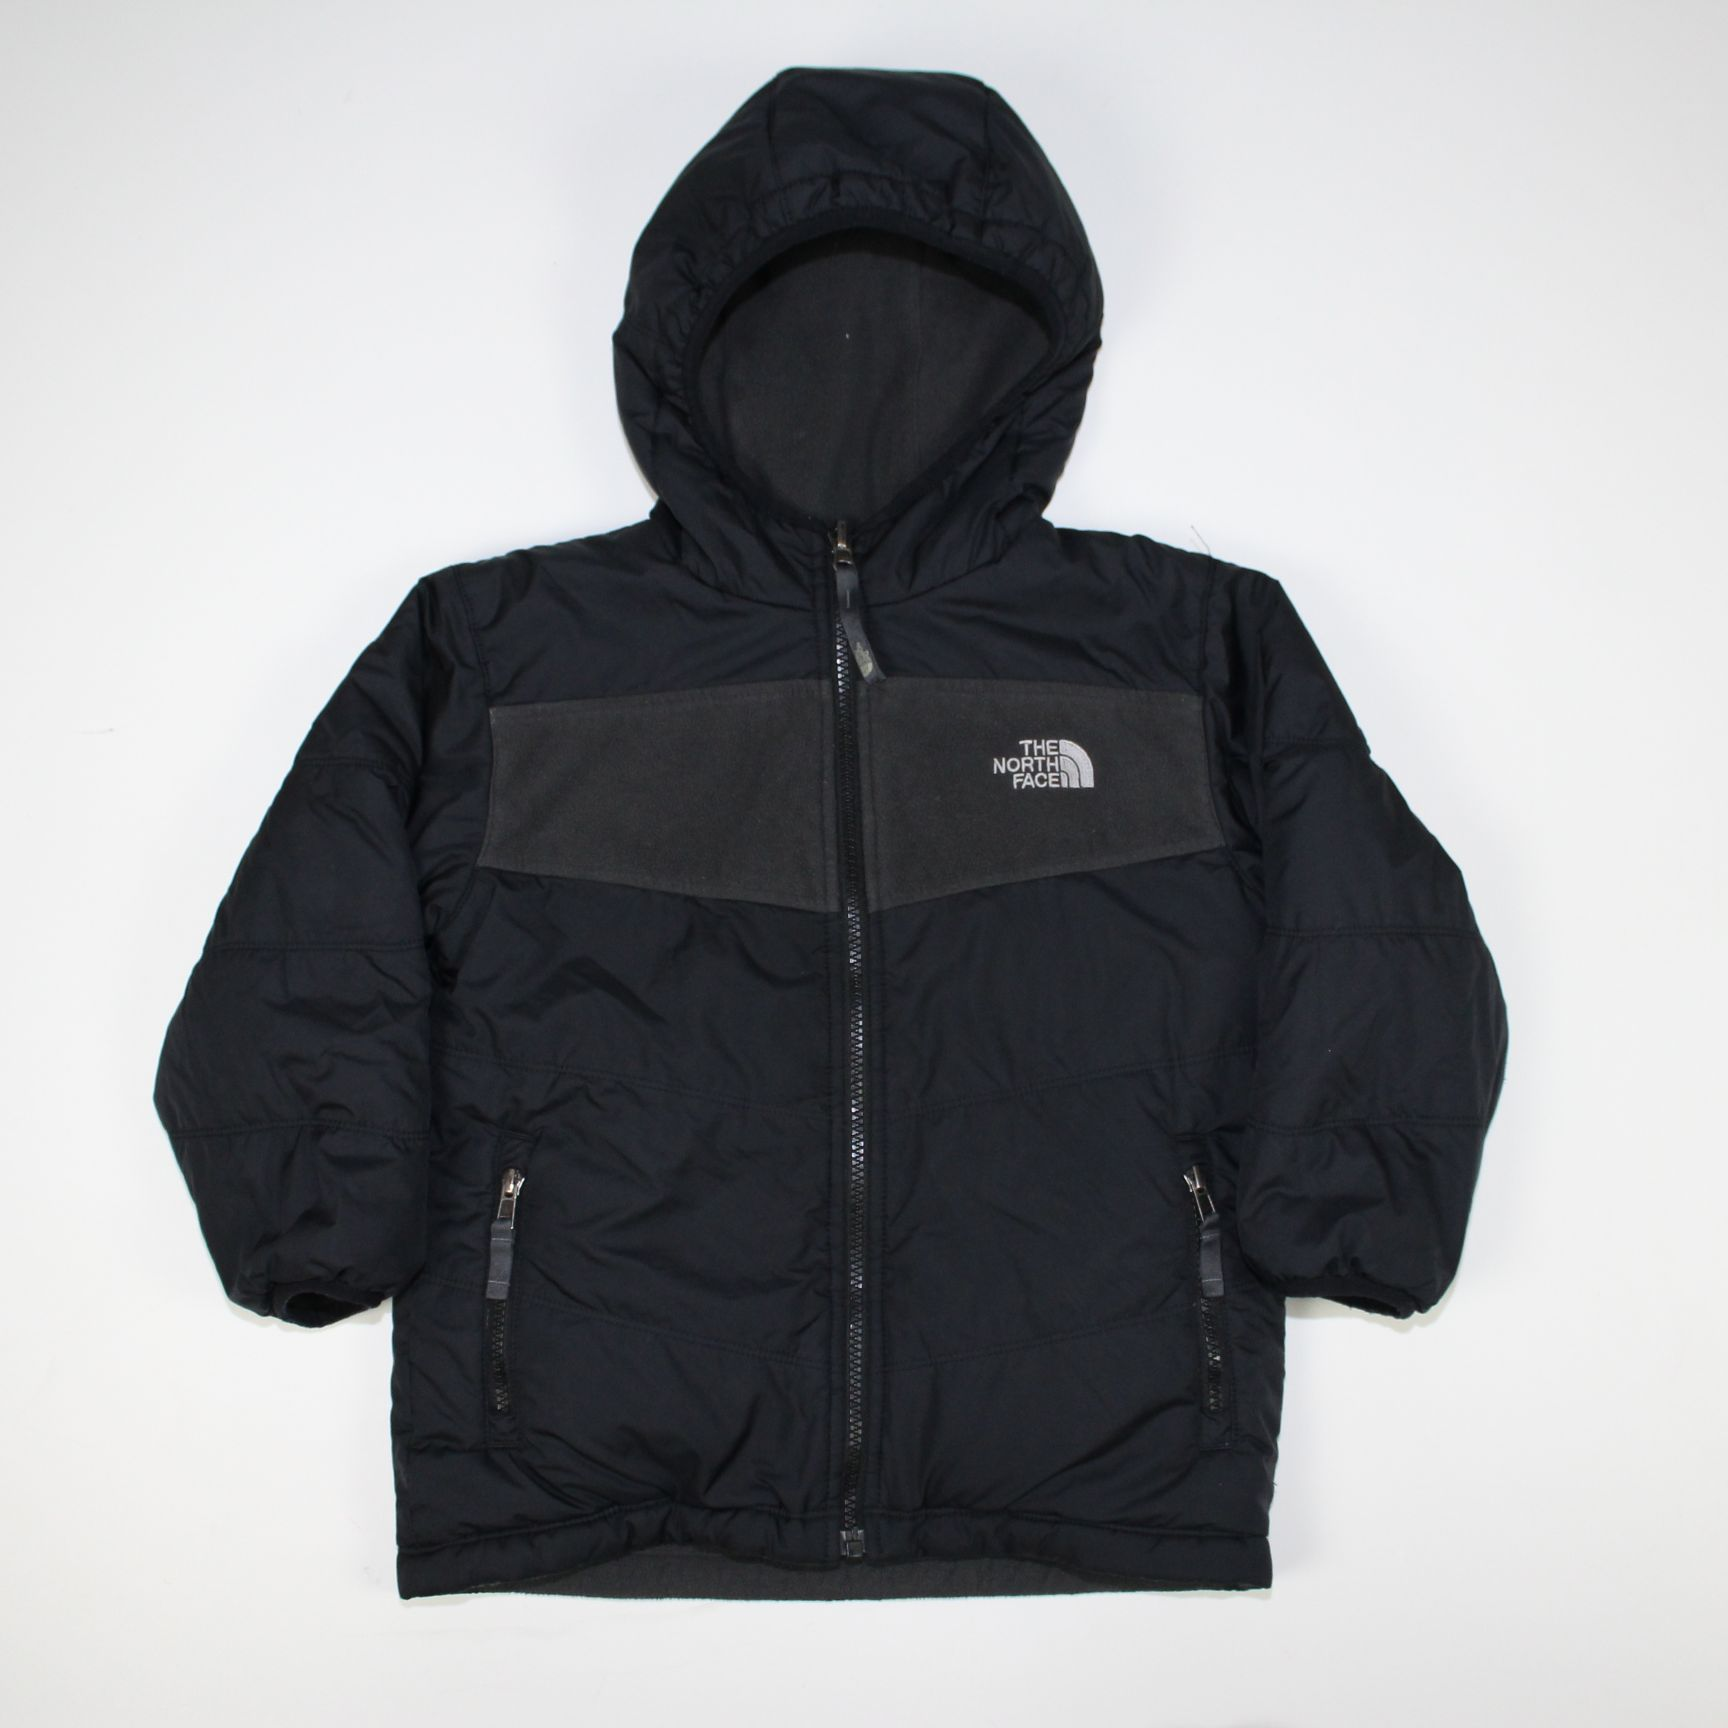 a76fc6d00e15 THE NORTH FACE boys reversible TRUE OR FALSE fleece jacket (XXS) AMFN